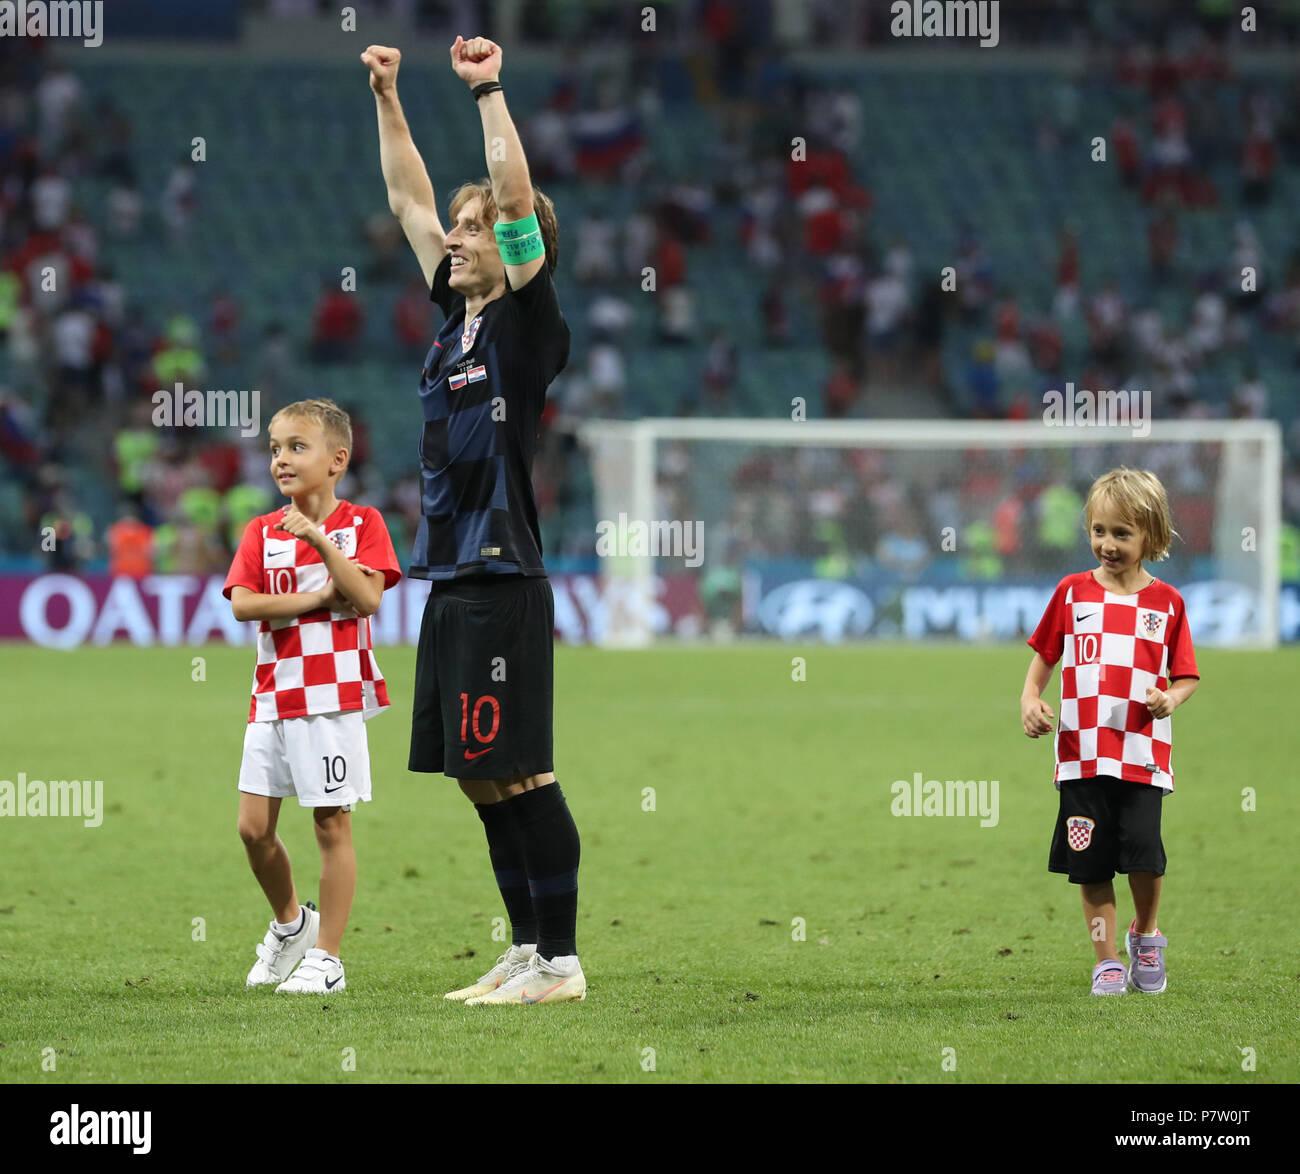 Luka Modrić Image 5: Luka Modric (c) Stock Photos & Luka Modric (c) Stock